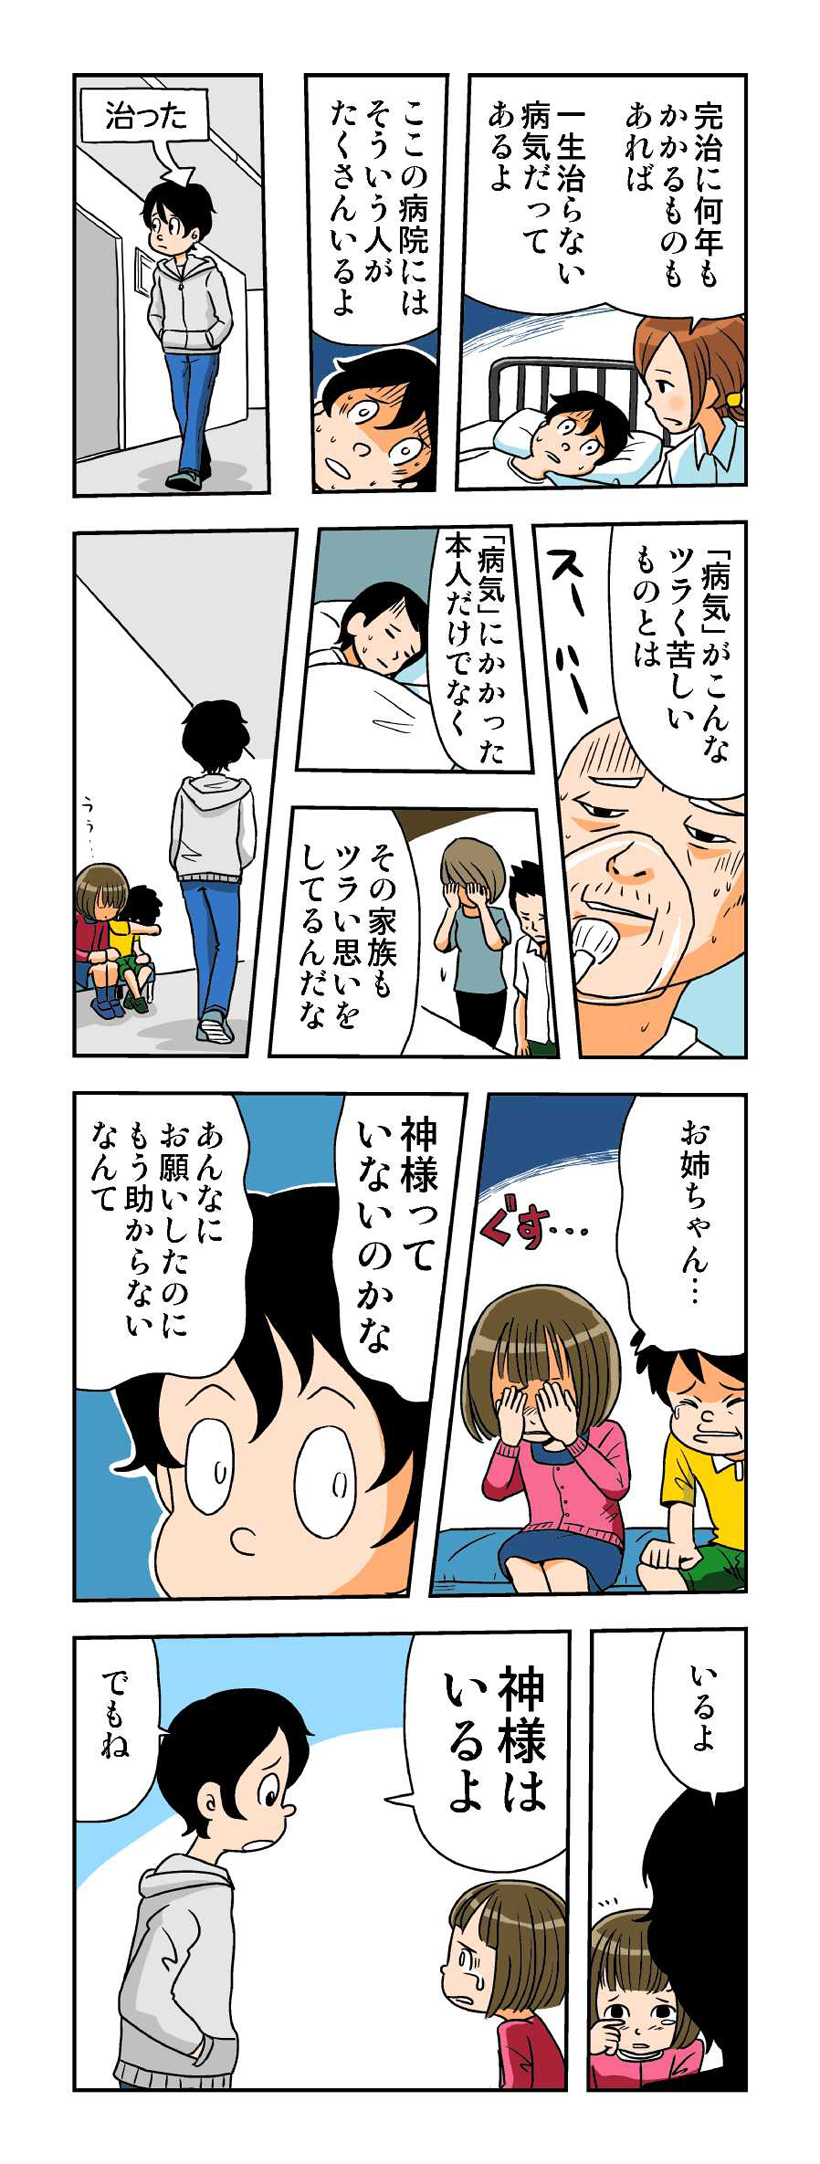 20160524_02